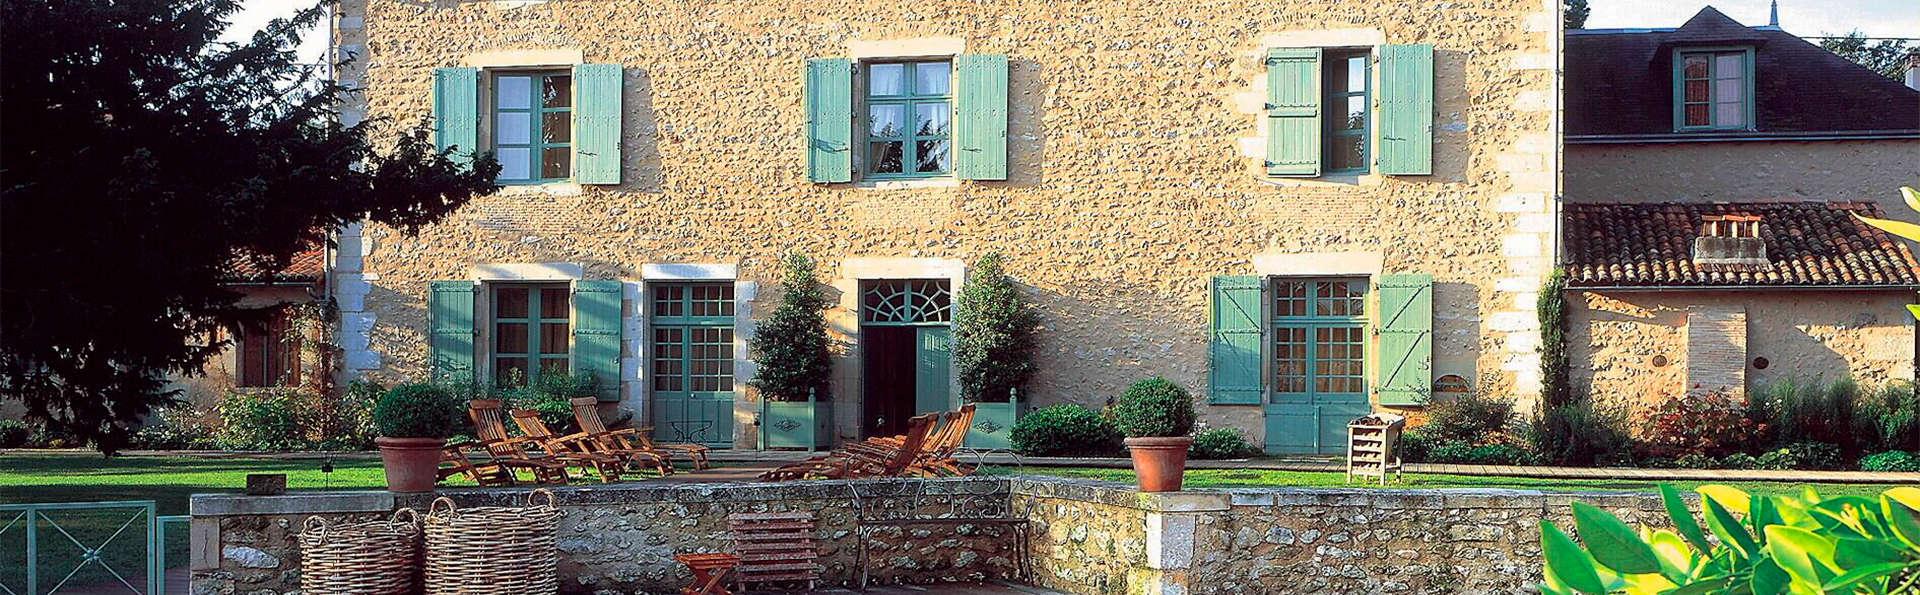 Hôtel Restaurant Les Orangeries - edit_Hotel_Restaurant_Les_Orangeries_Facade_jardin.jpg